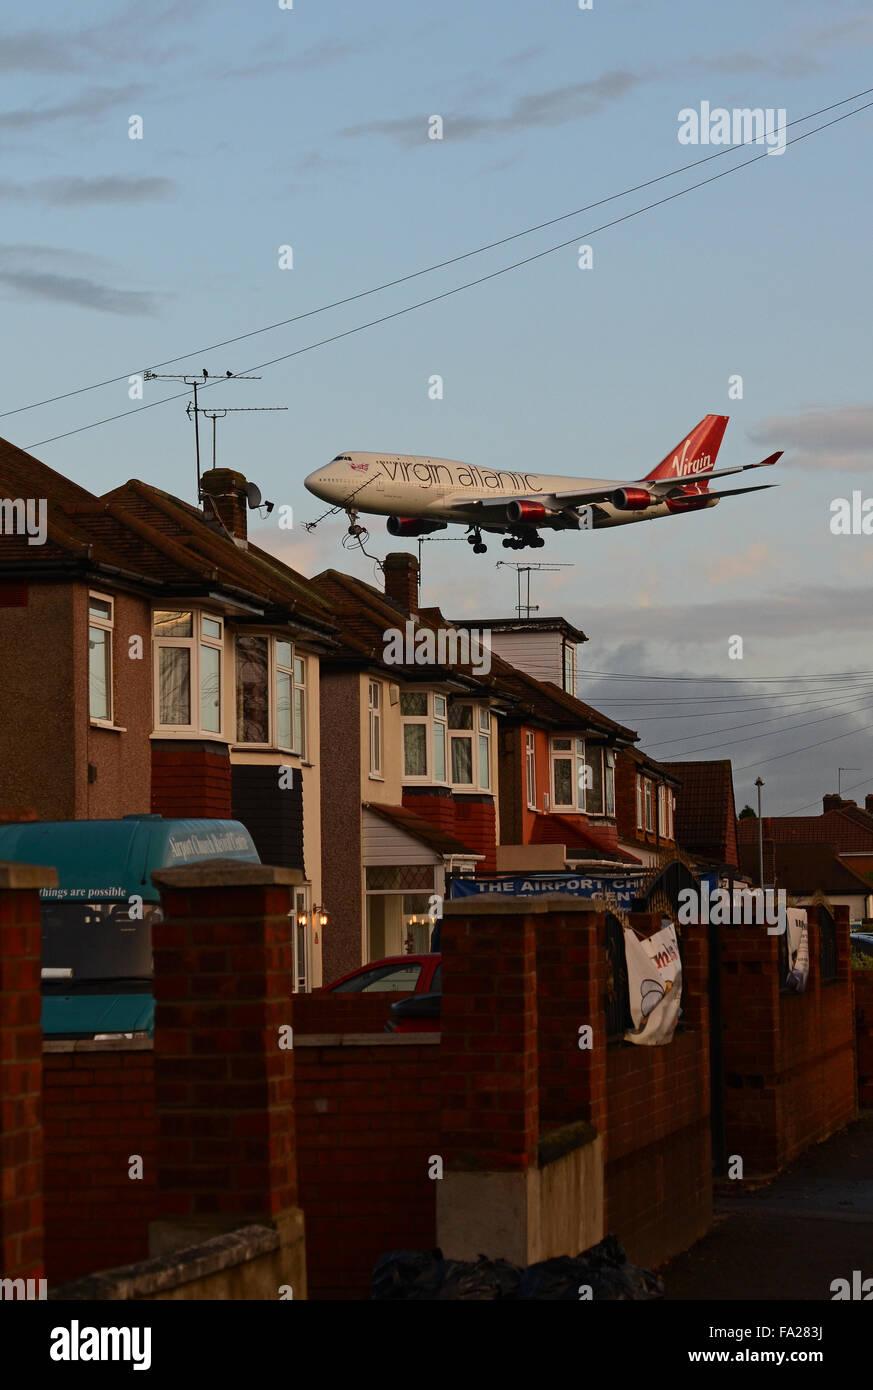 Virgin Atlantic Boeing 747 Jumbo Jet airliner plane landing at London Heathrow Airport, UK low over local housing Stock Photo